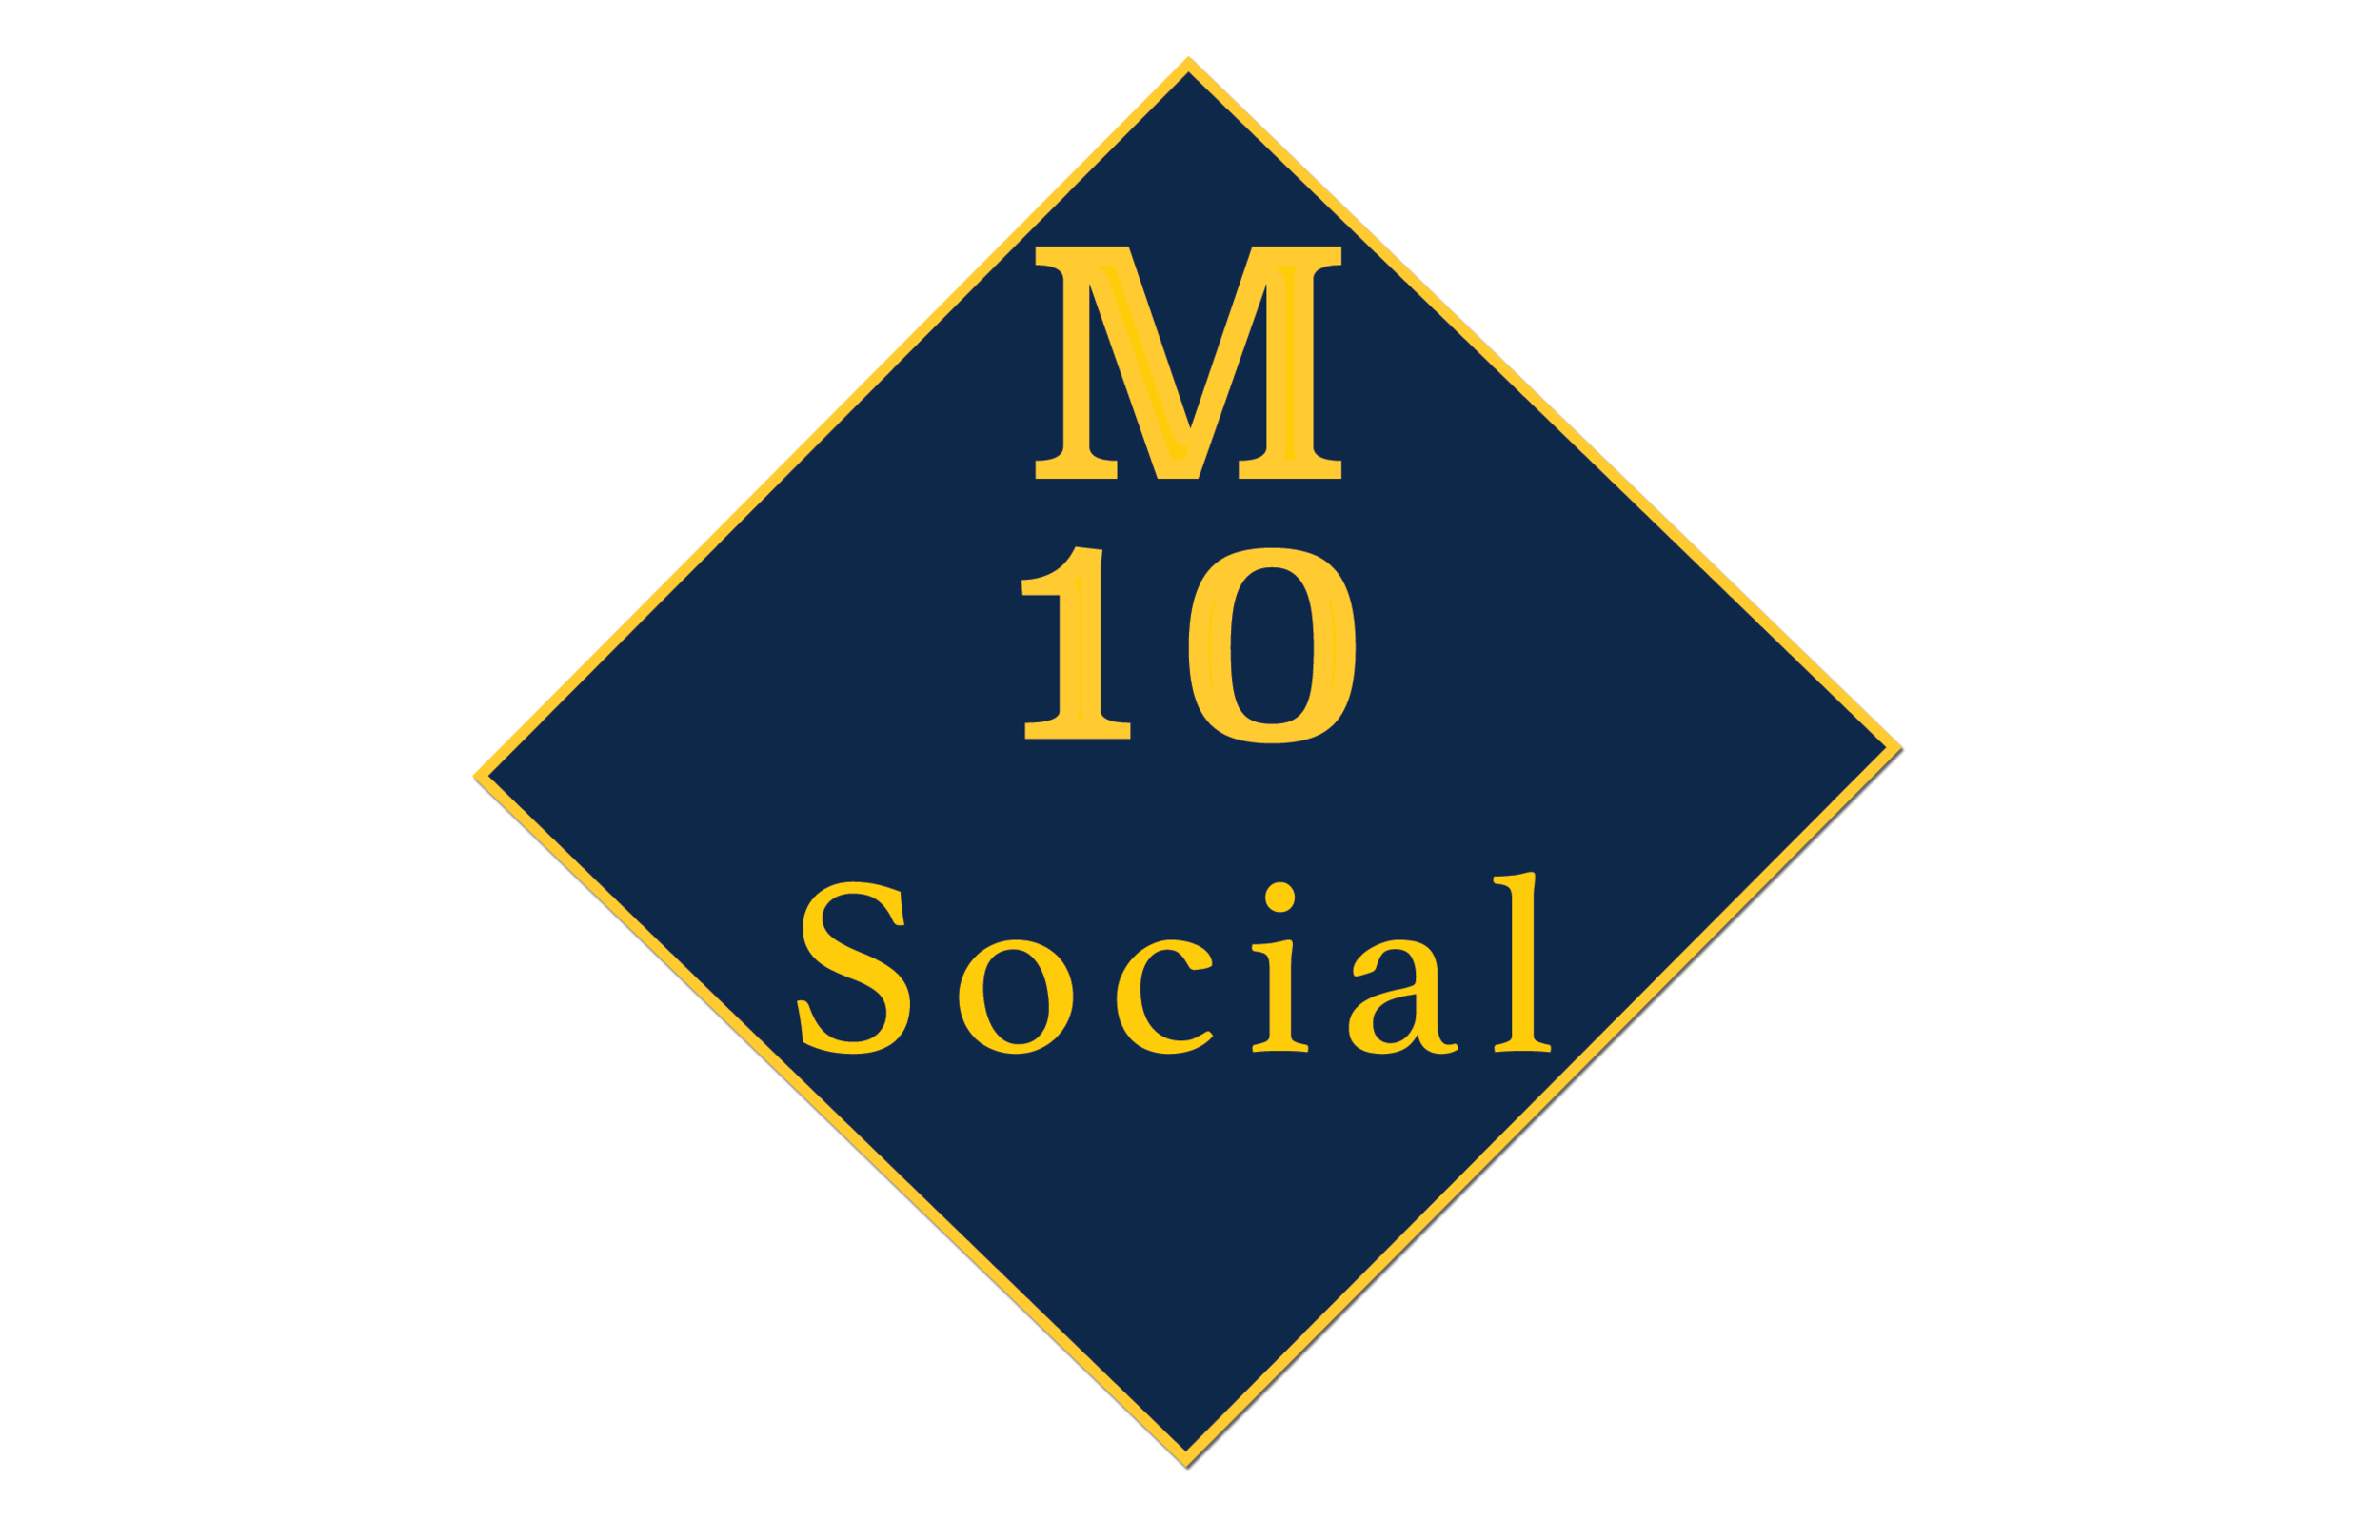 M10_Social_logo.jpg